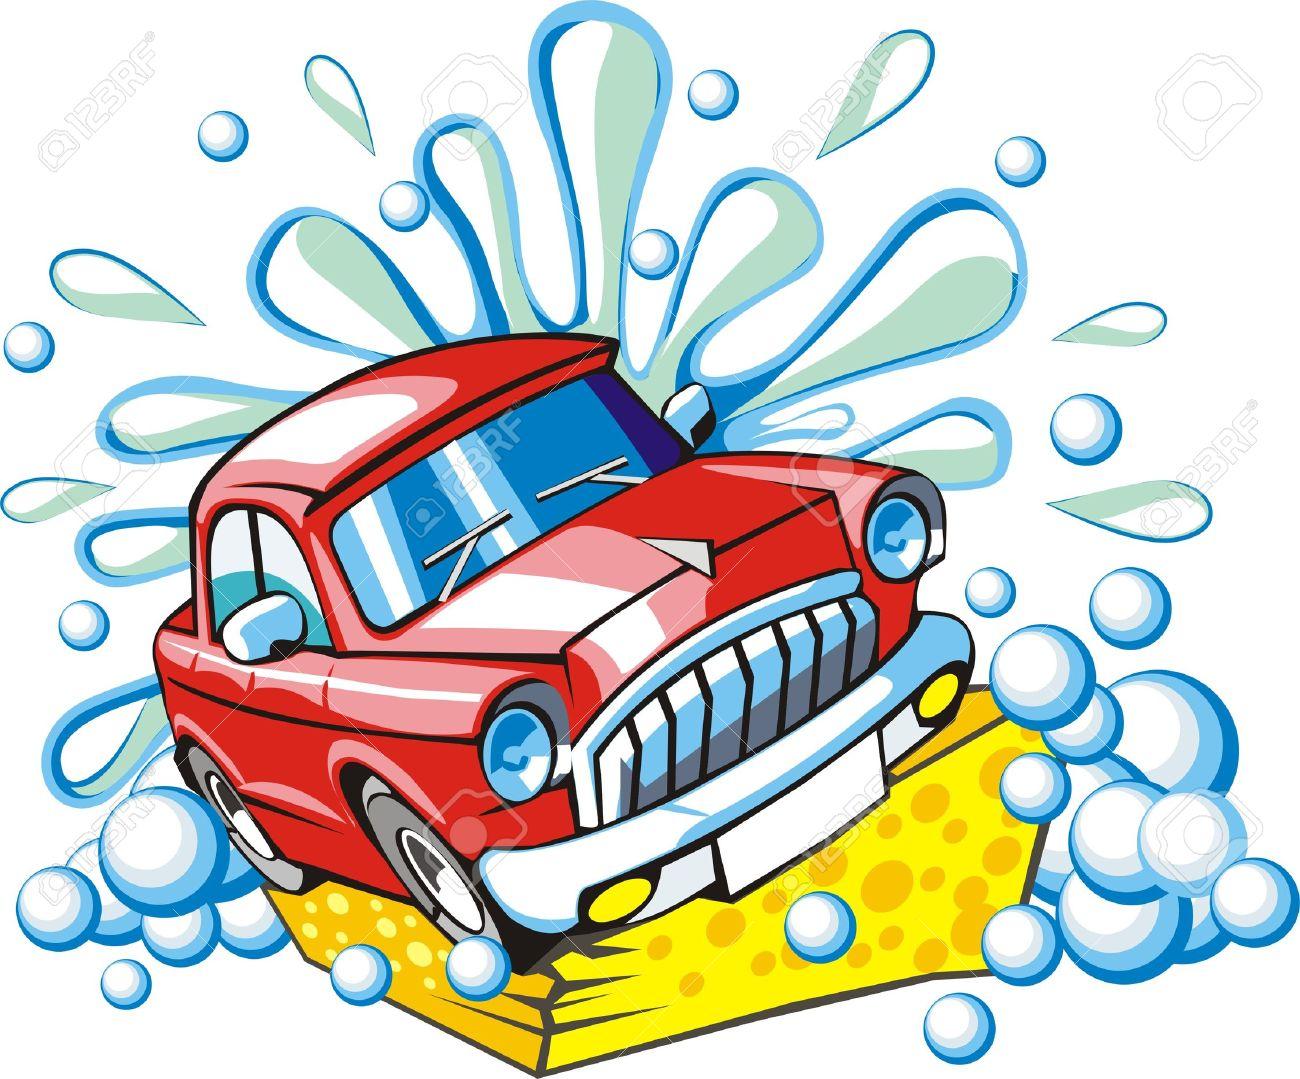 sign a car body washing royalty free cliparts vectors and stock rh 123rf com free car wash clipart pictures free car wash pictures clip art